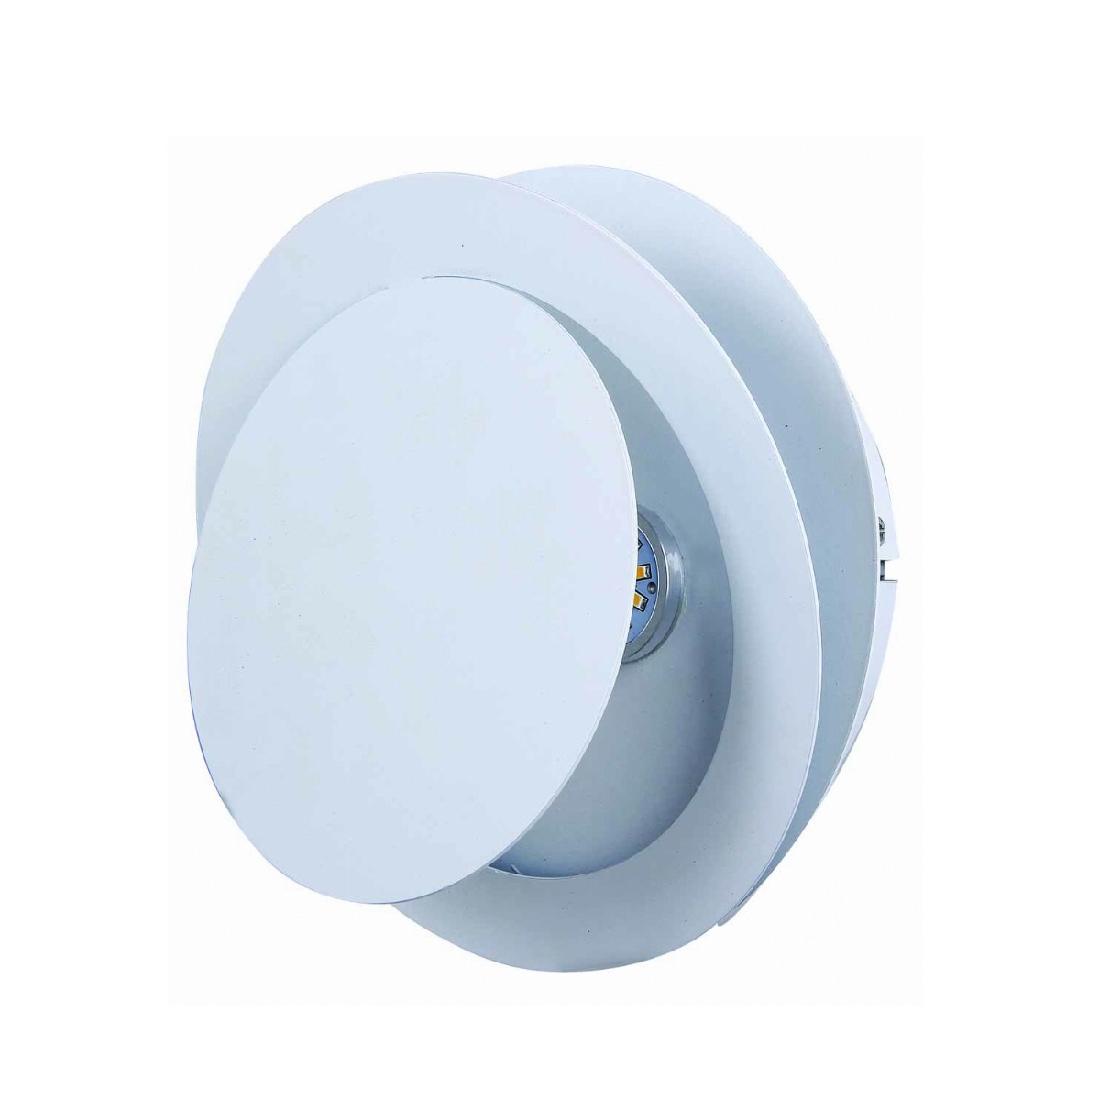 K2 GLOBAL KSL106 - Dekoratif LED Aplik